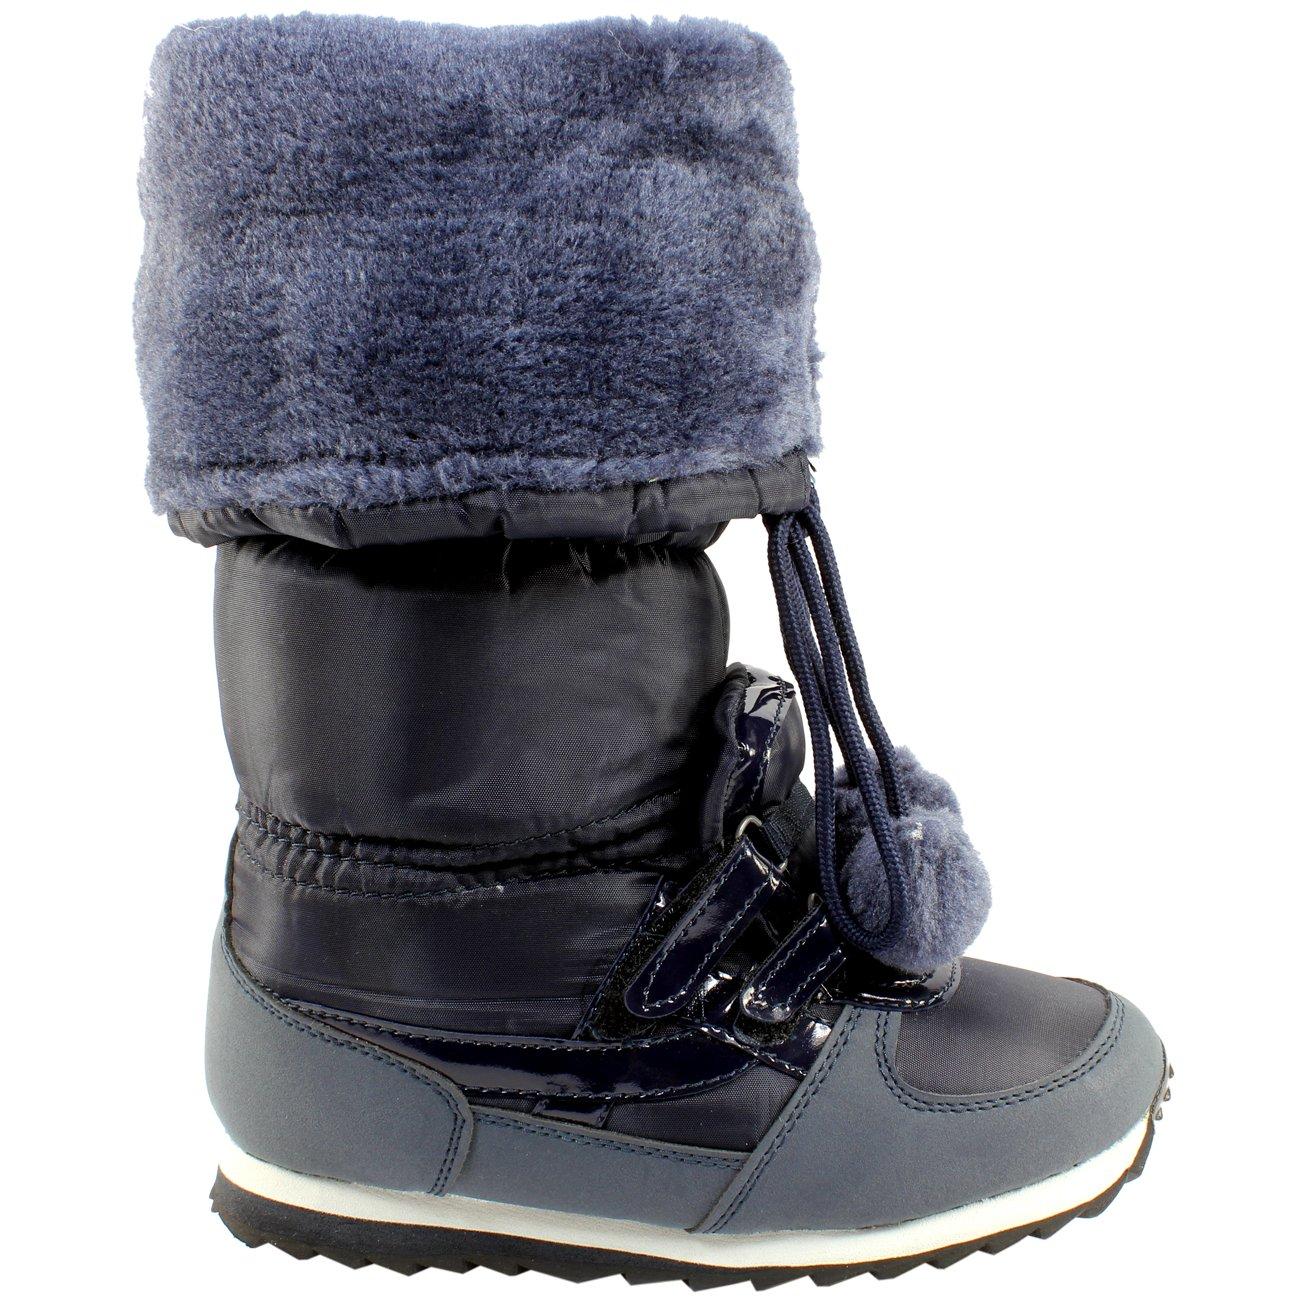 Ela Damen Fellstiefel Wasserdichte Schnee Bobble Stiefel Stiefel